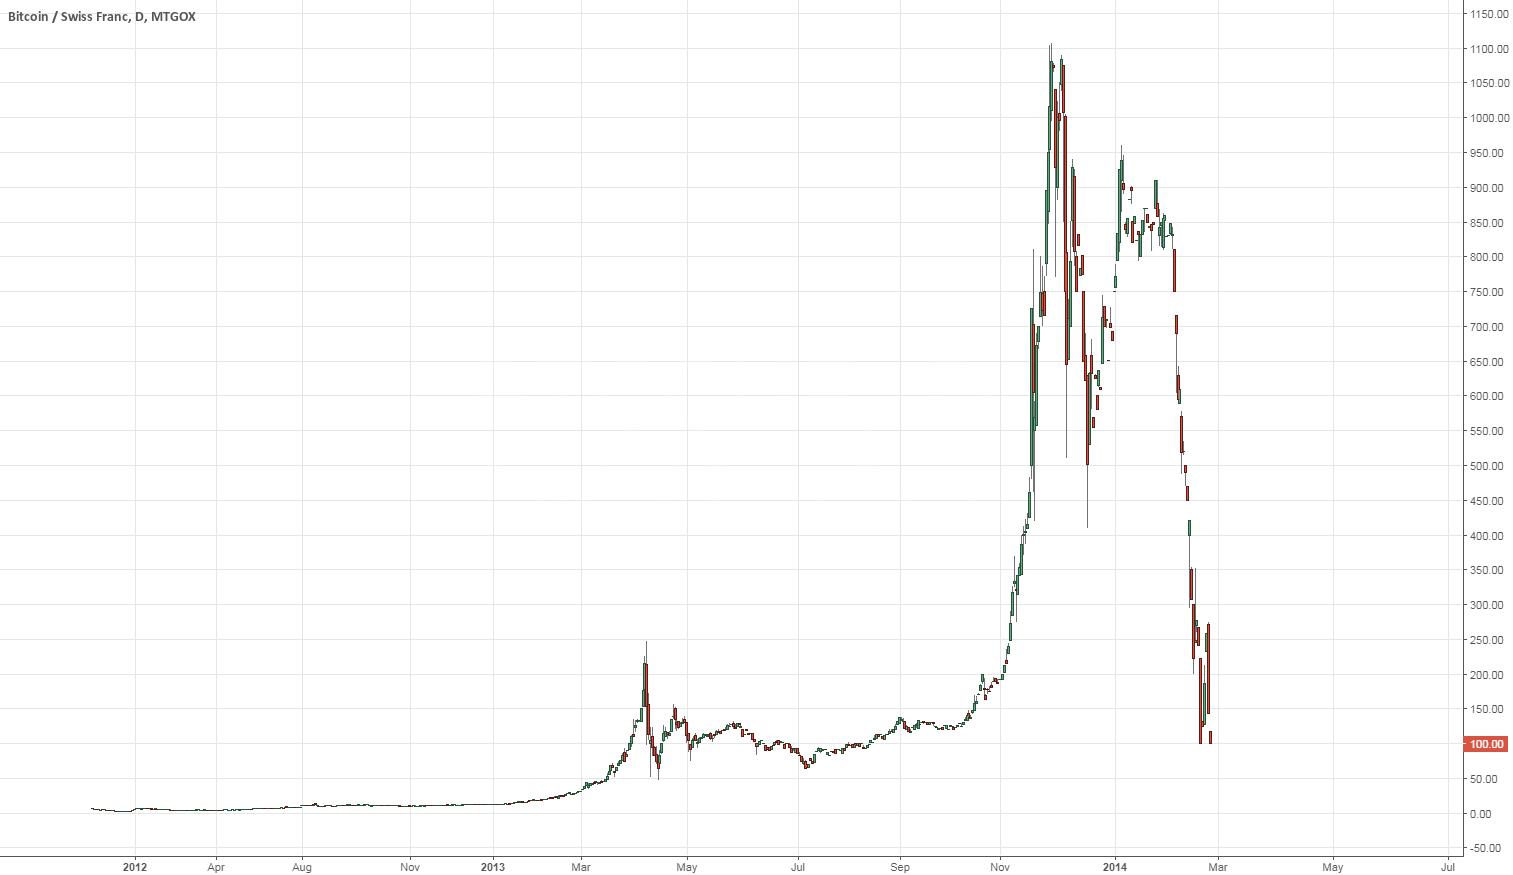 BTCCHF finish bubble